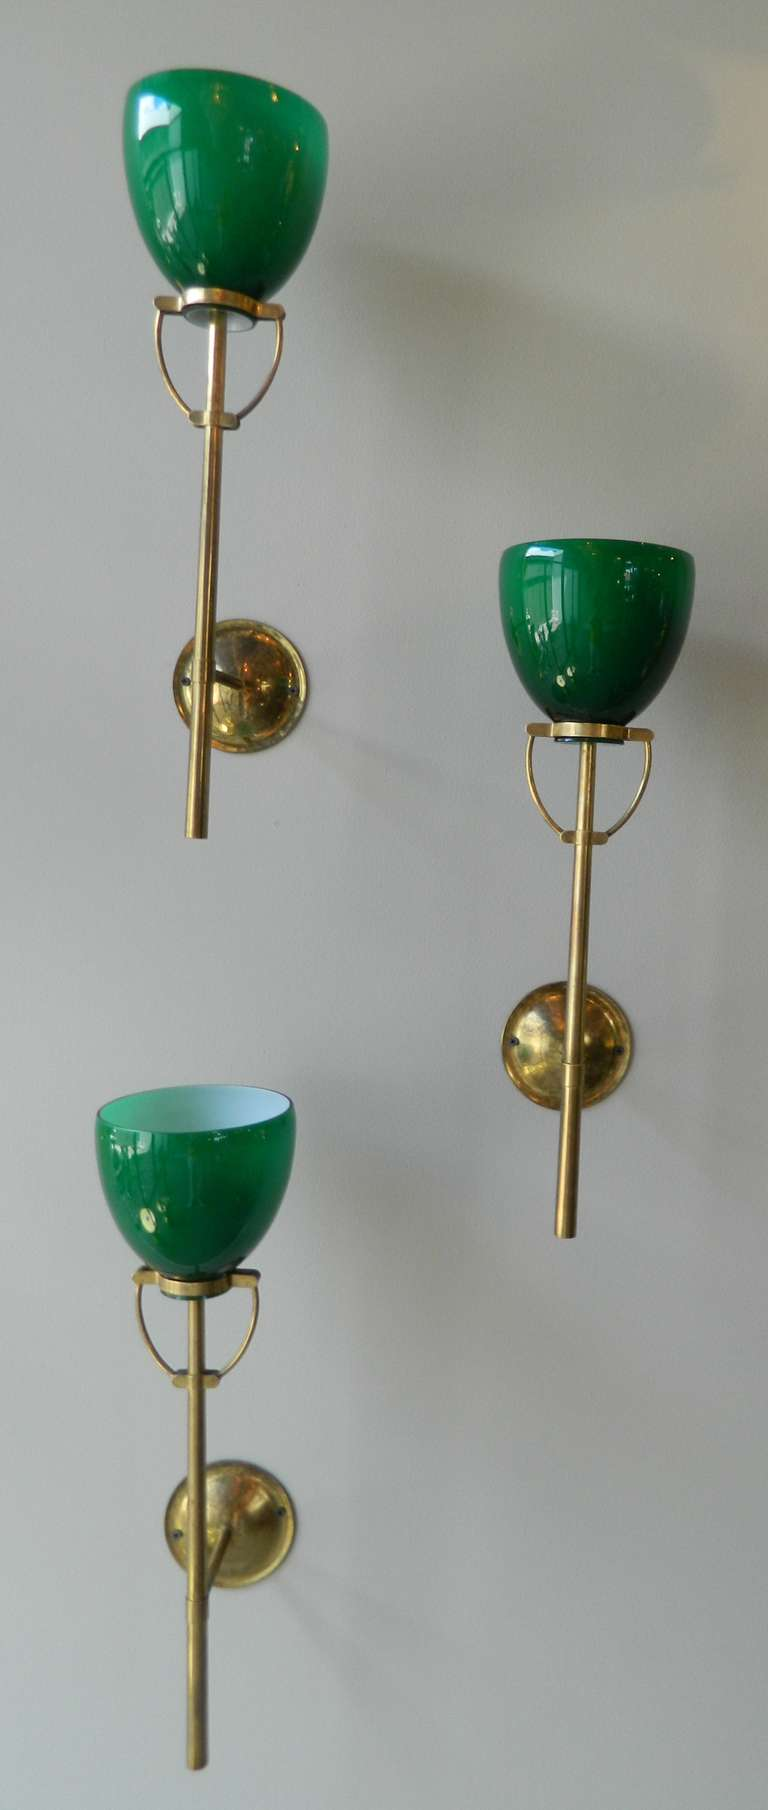 Three Italian Green Glass Sconces, 1940 s at 1stdibs